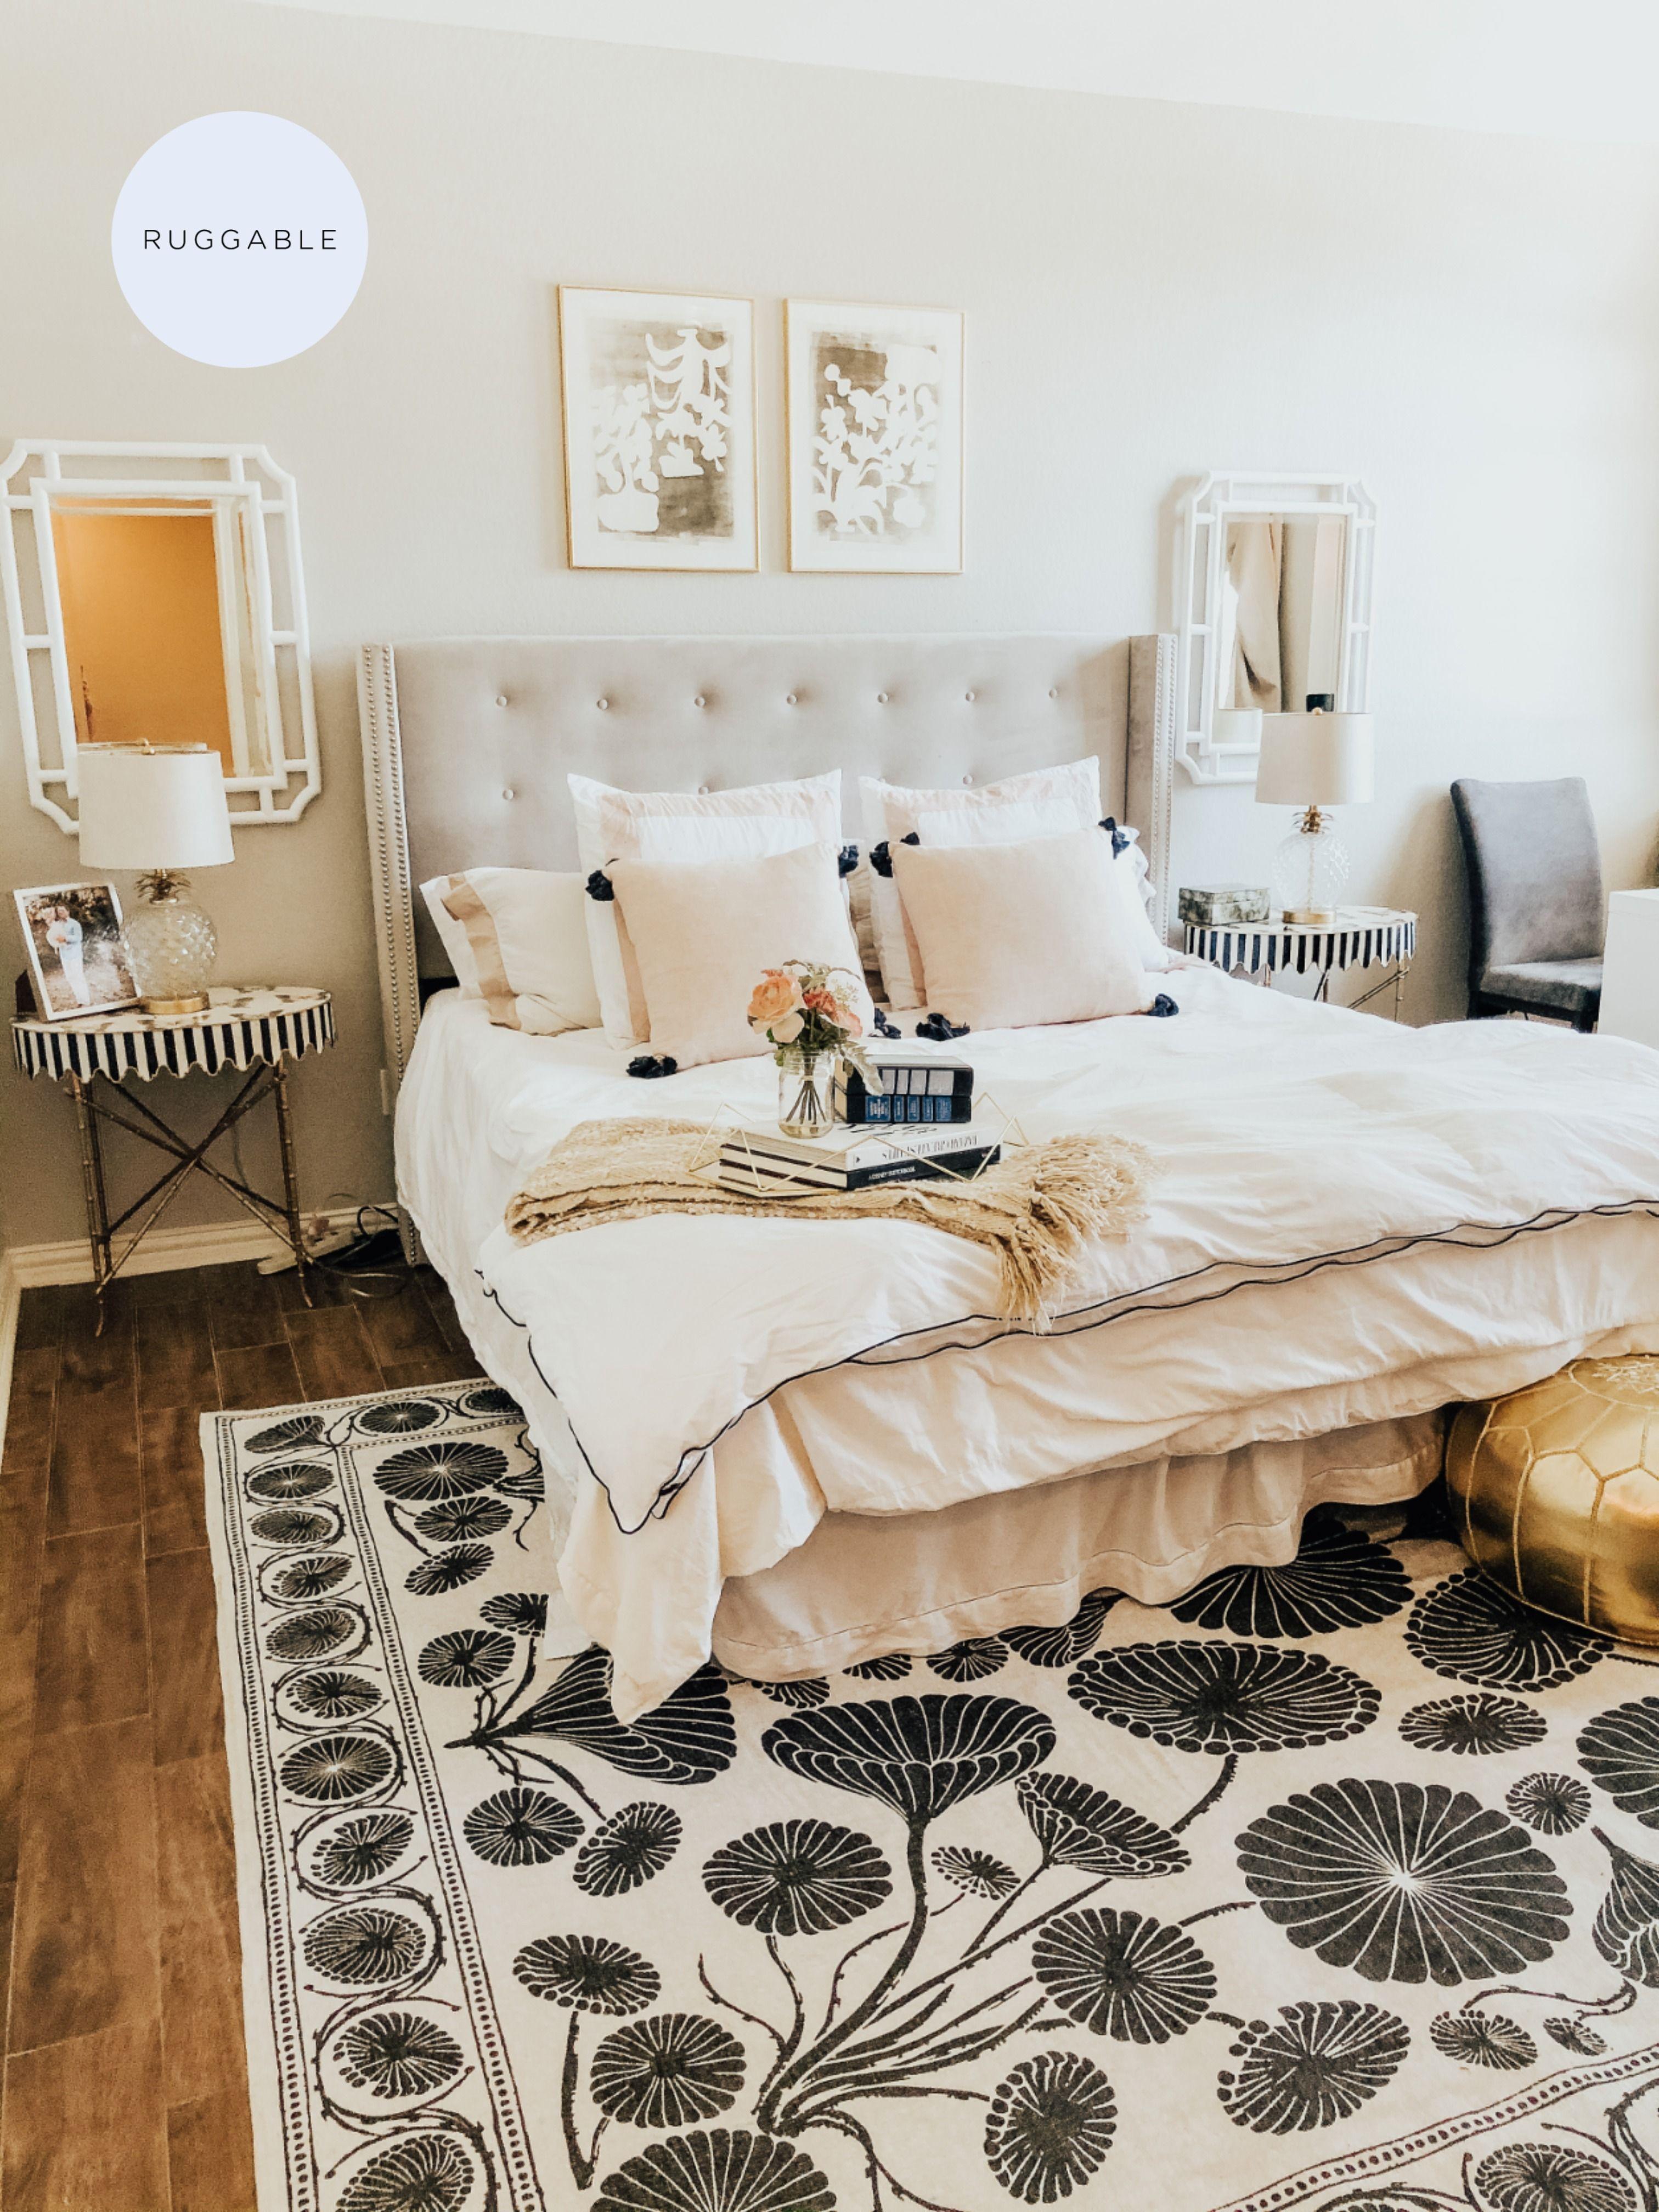 Cynthia Rowley Suzani White Rug Aesthetic Bedroom Apartment Decor Home Decor